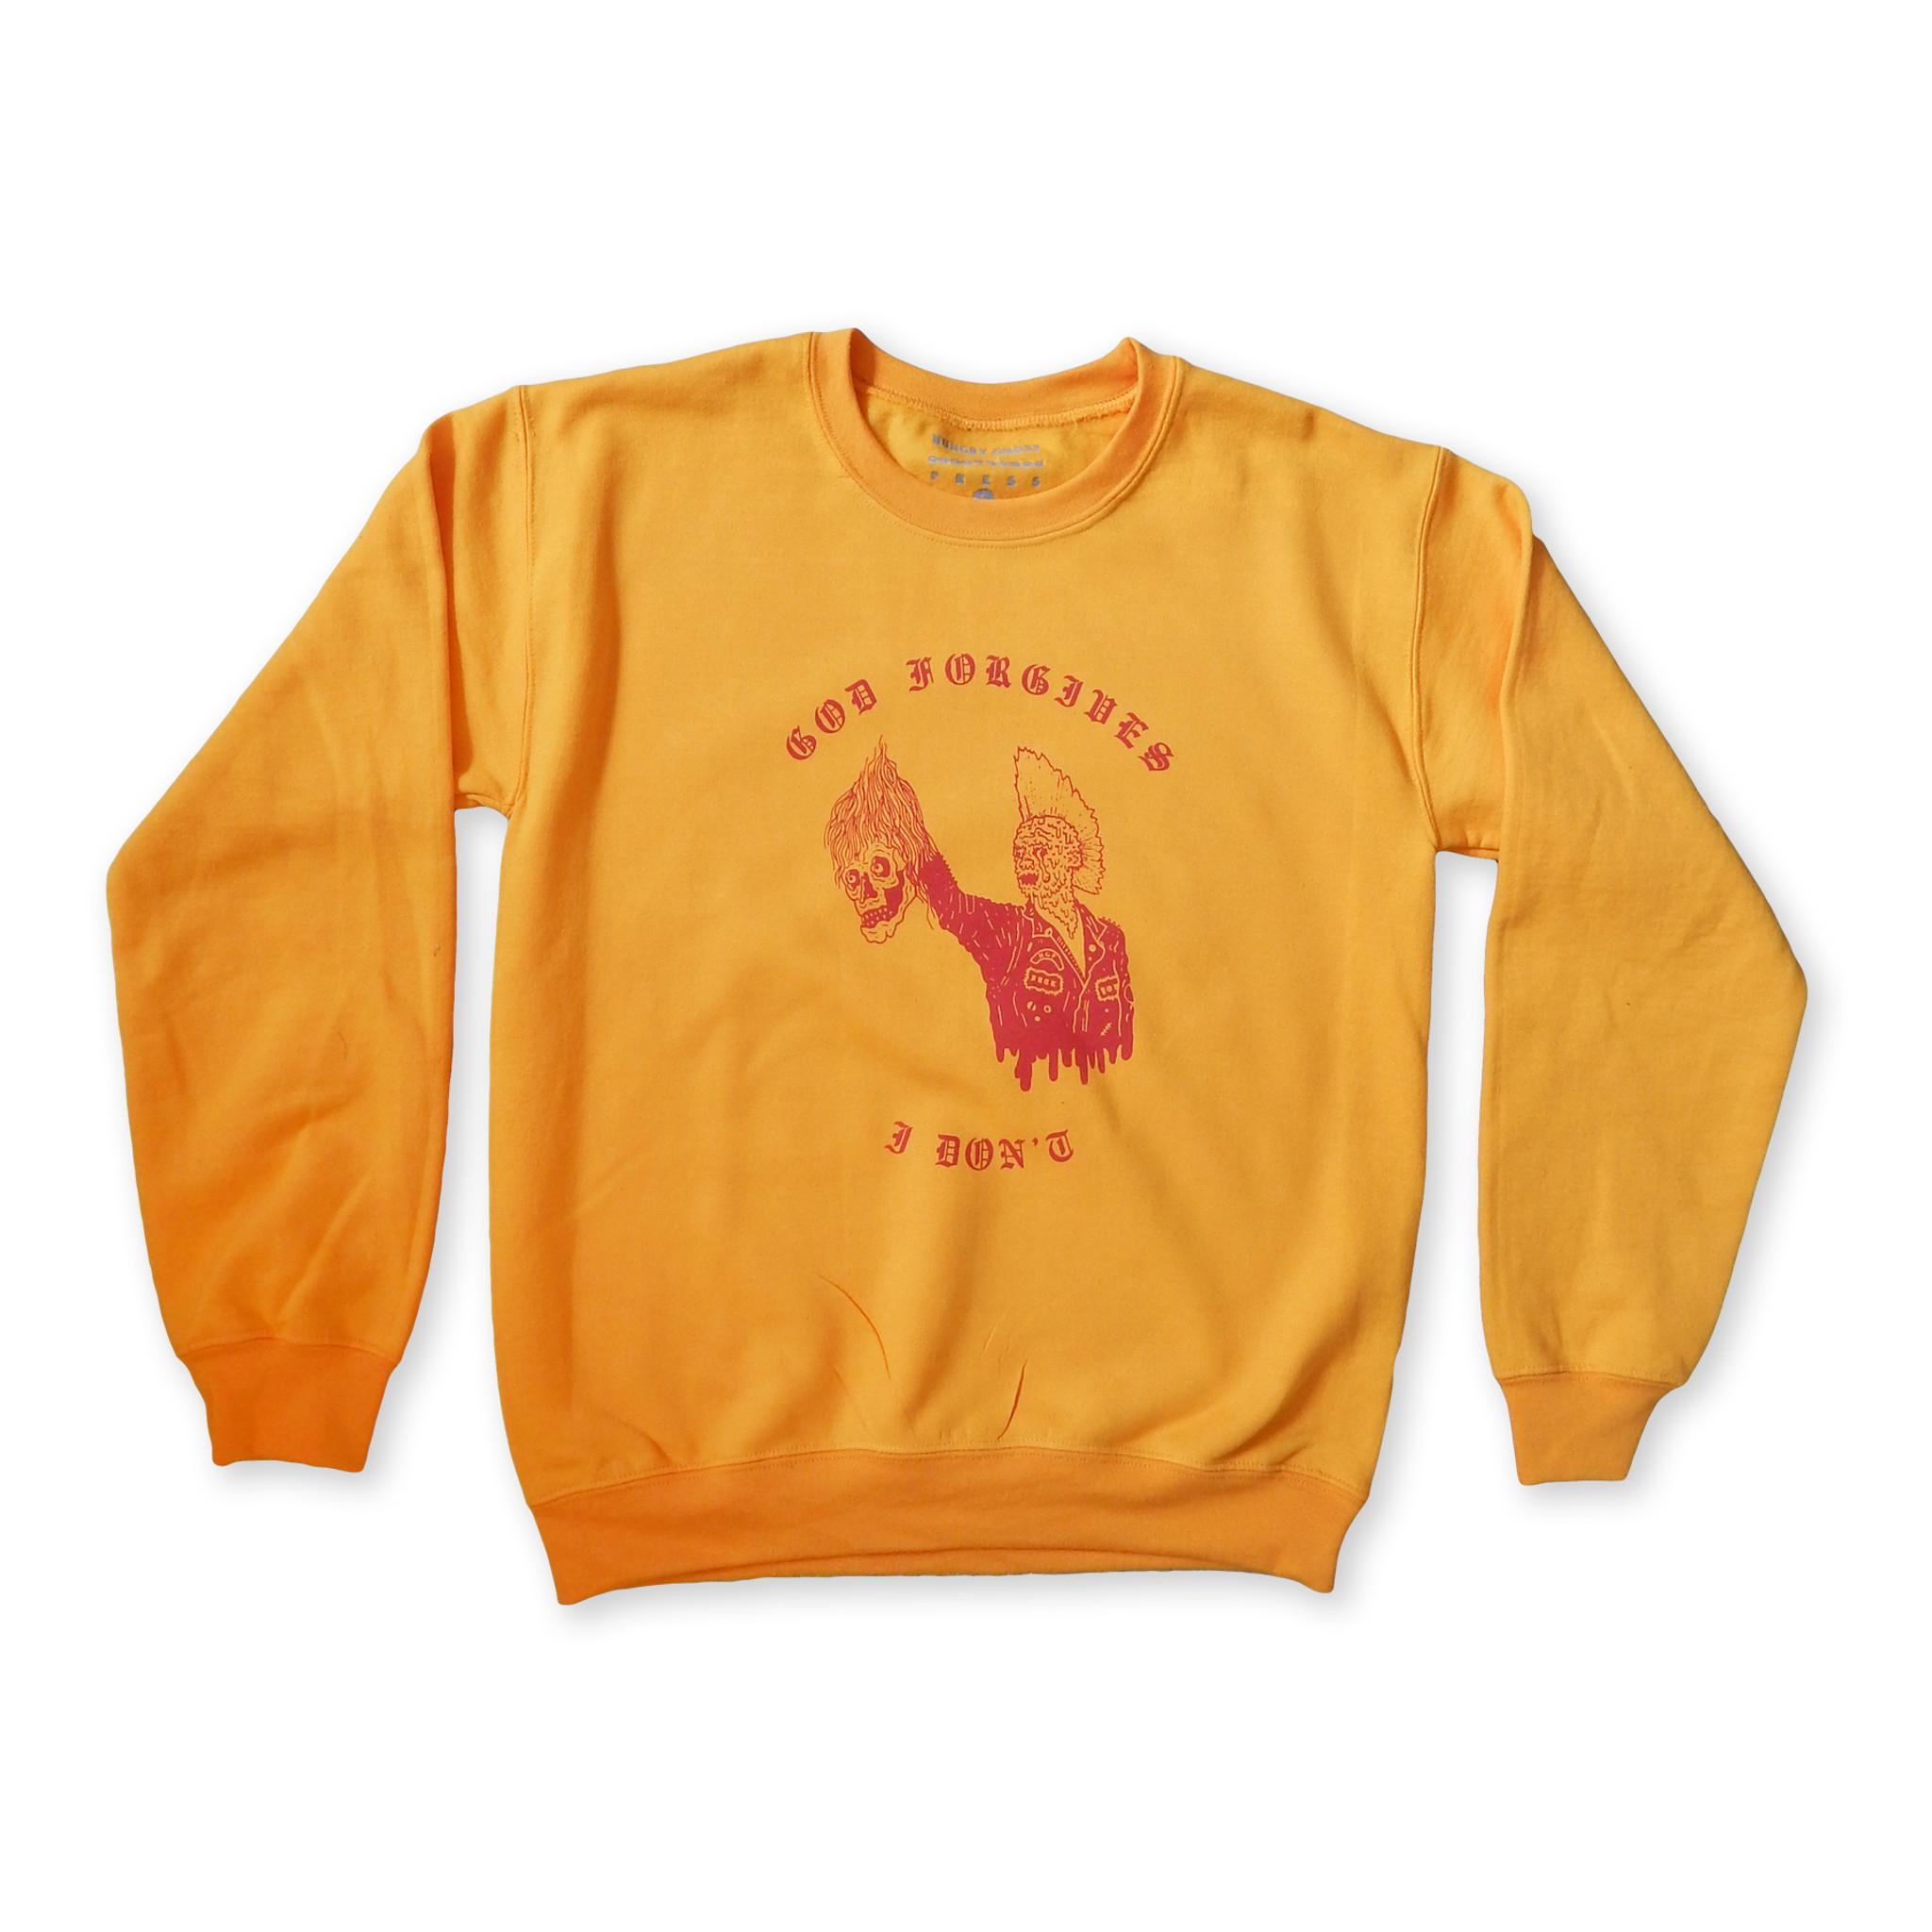 Forgiver Crew Neck Sweatshirt